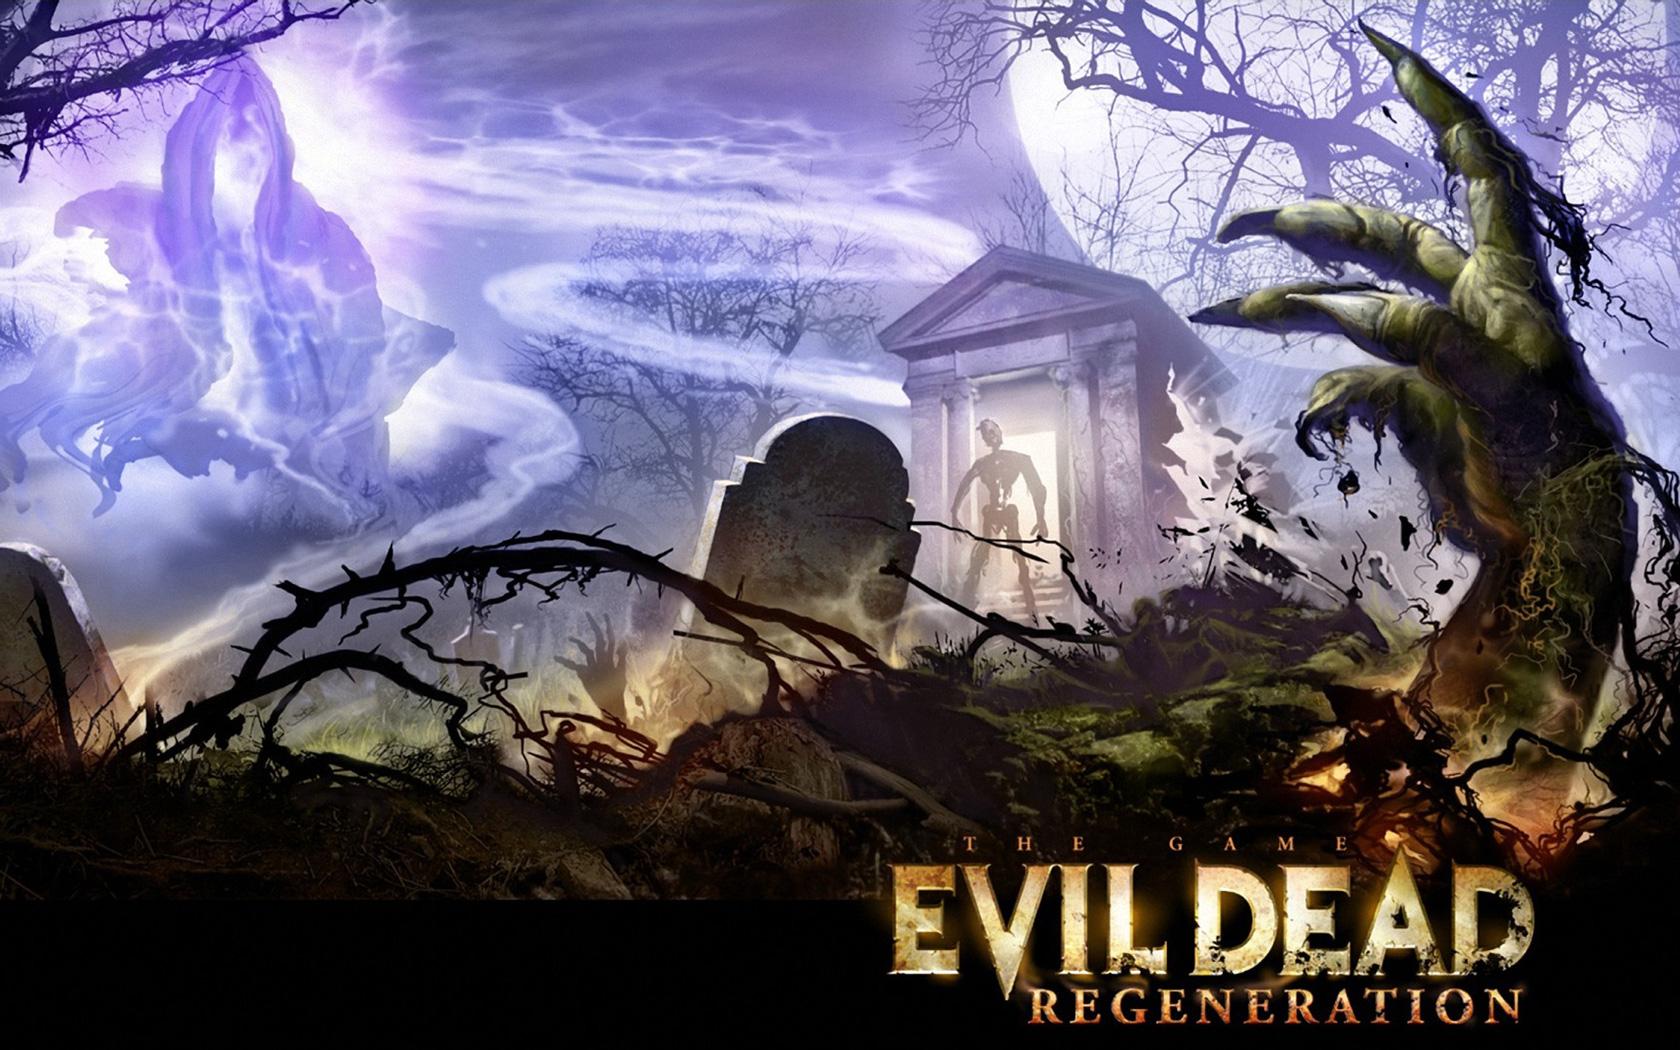 Evil Dead: Regeneration Wallpaper in 1680x1050